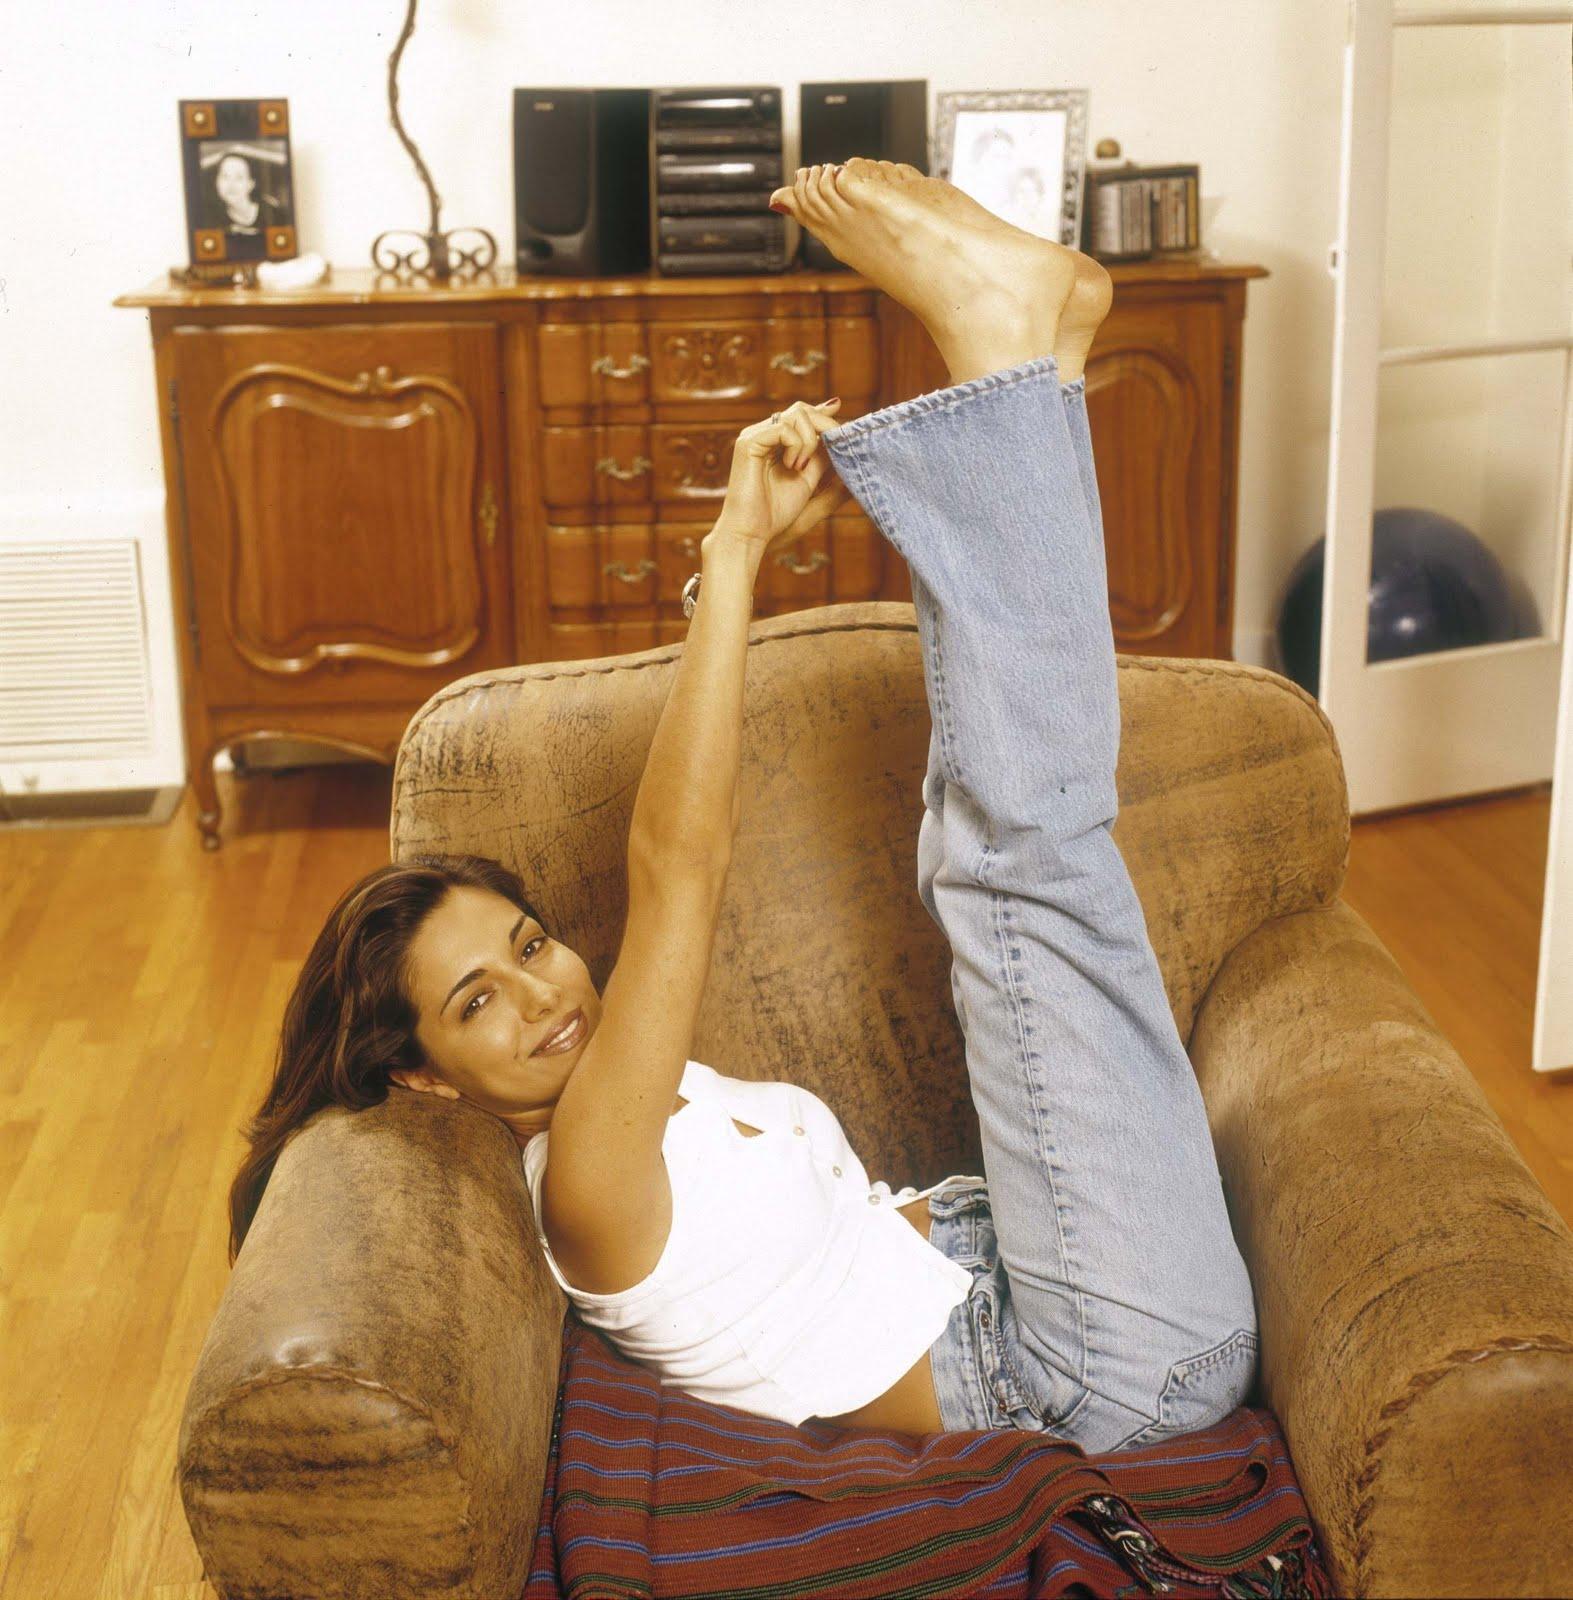 http://4.bp.blogspot.com/_bQ0SqifjNcg/S-OHGjuEl3I/AAAAAAAAUEM/EXhNjYLhzVk/s1600/vanessa-marcil-feet-4.jpg